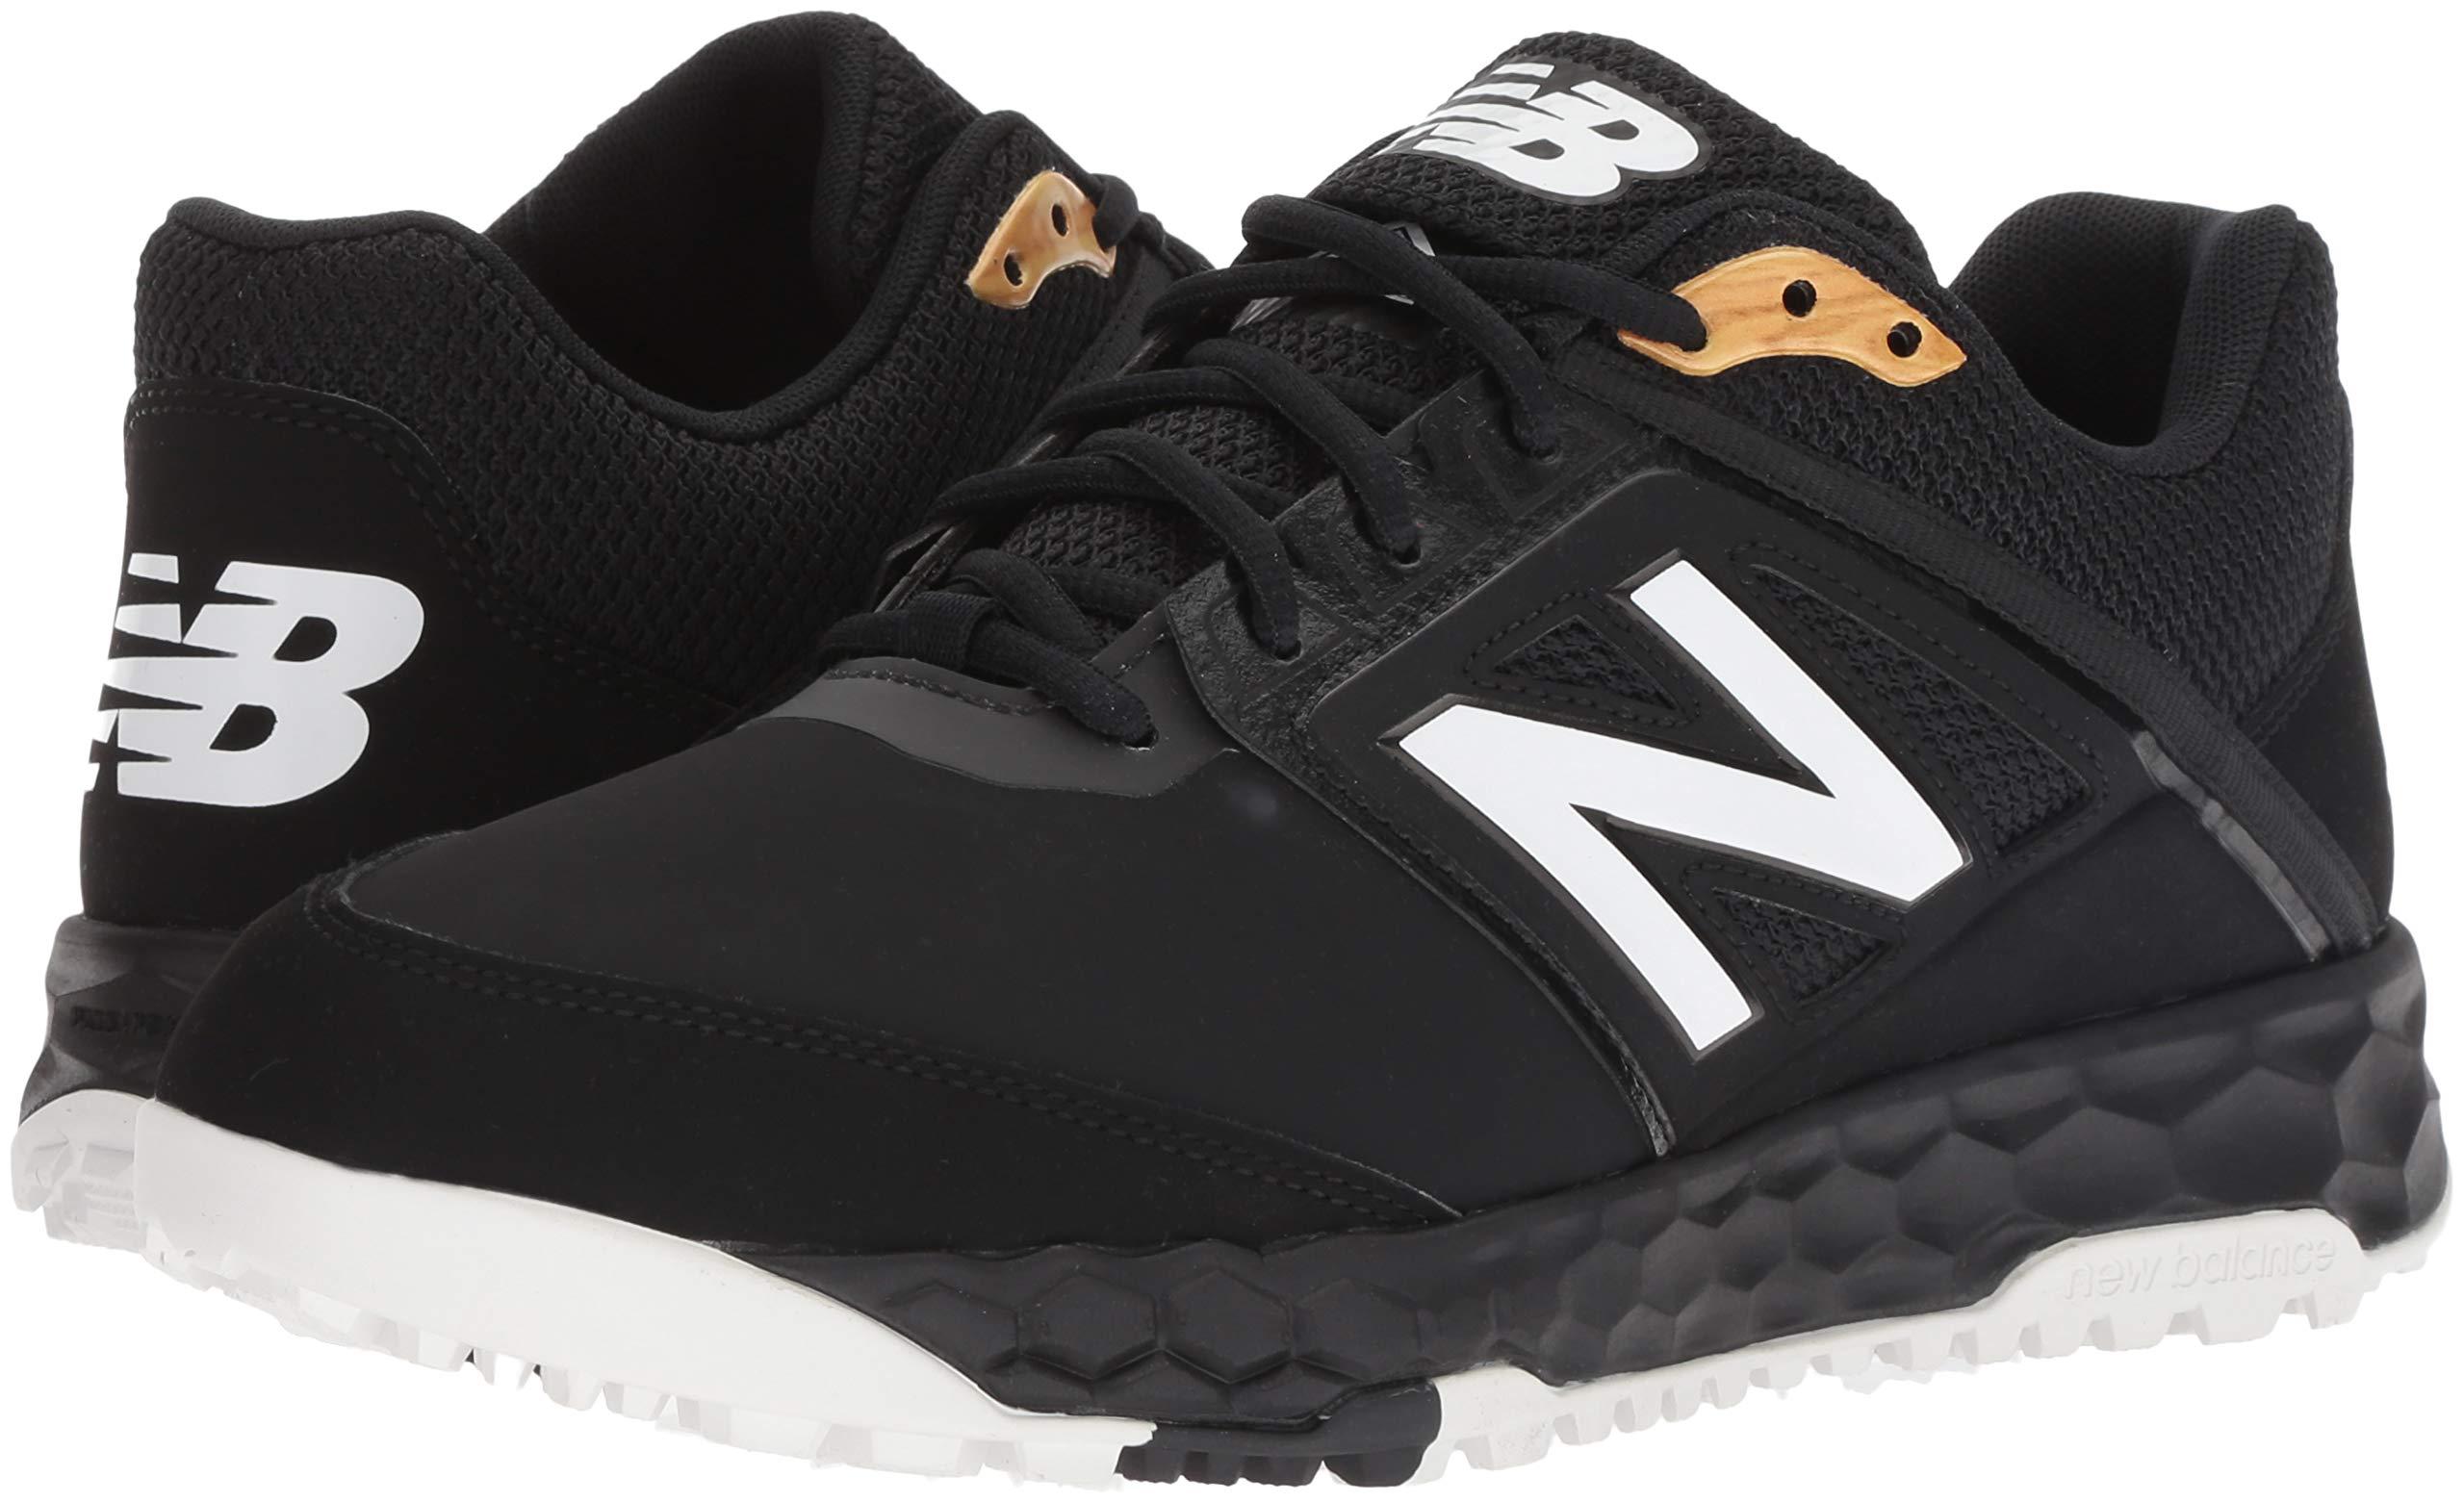 New Balance Men's 3000v4 Turf Baseball Shoe, Black, 5 D US by New Balance (Image #6)